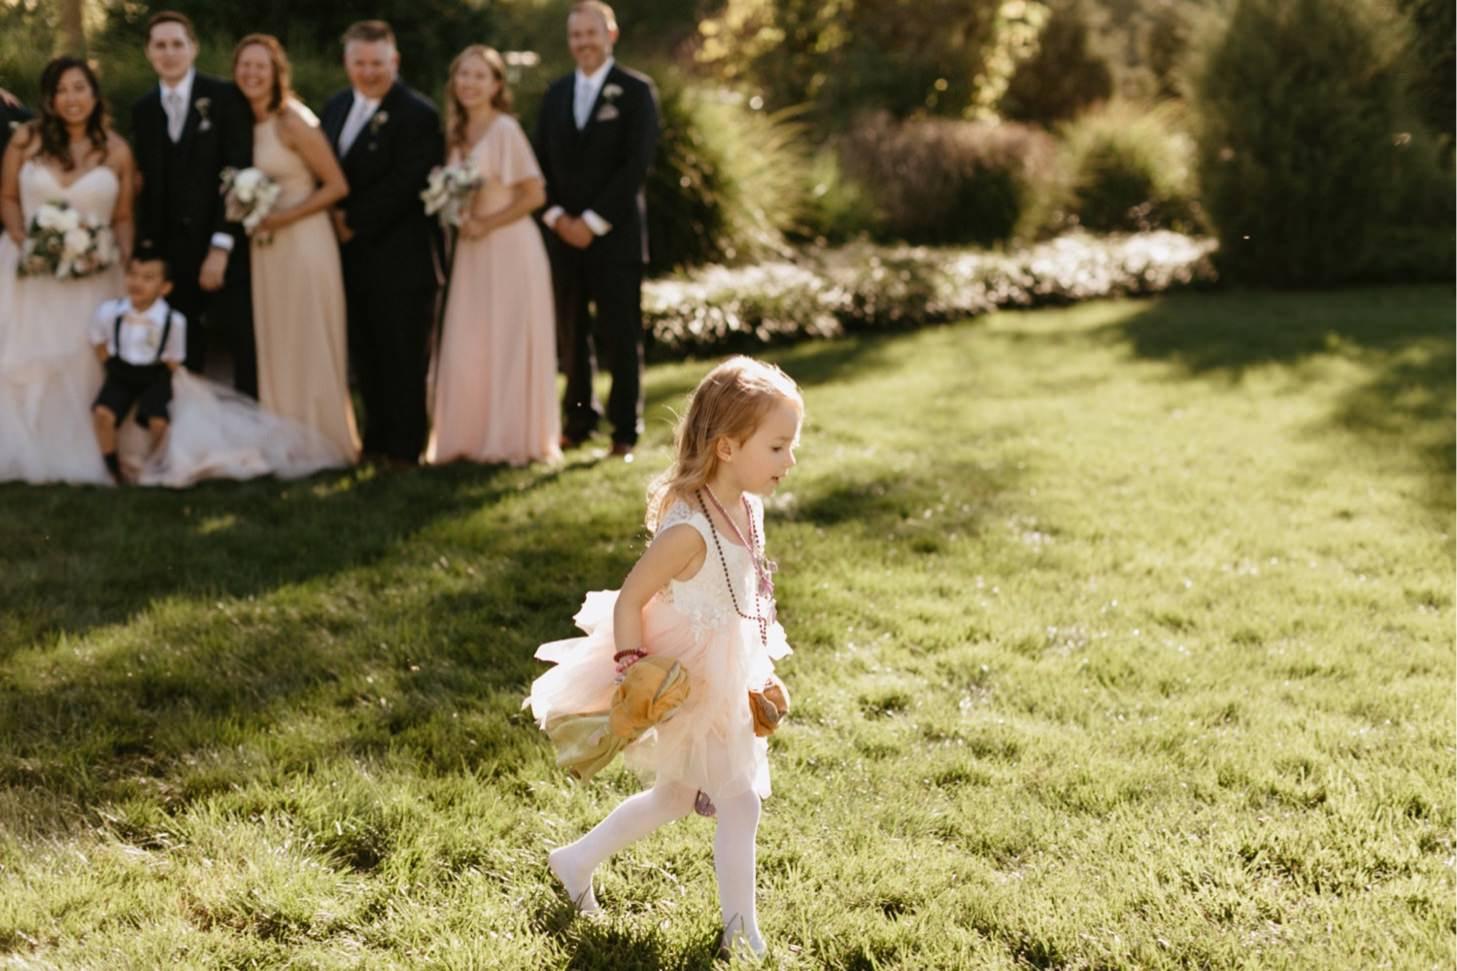 ritz-charles-wedding-reception-downtown-indianapolis-wedding-photographer016.JPG